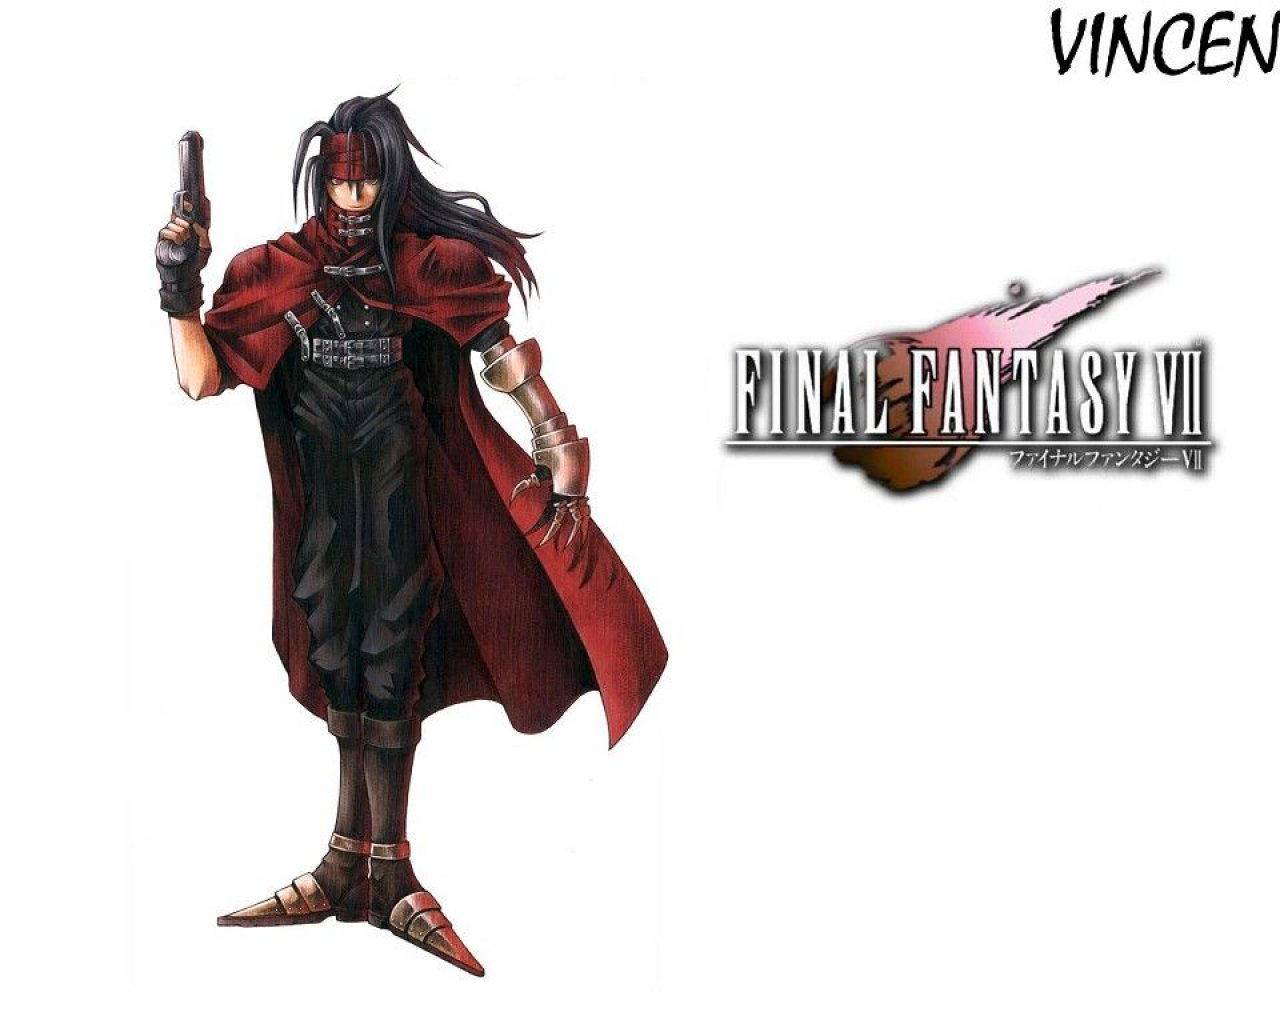 Final Fantasy 7 Wallpapers Download Final Fantasy 7 Wallpapers